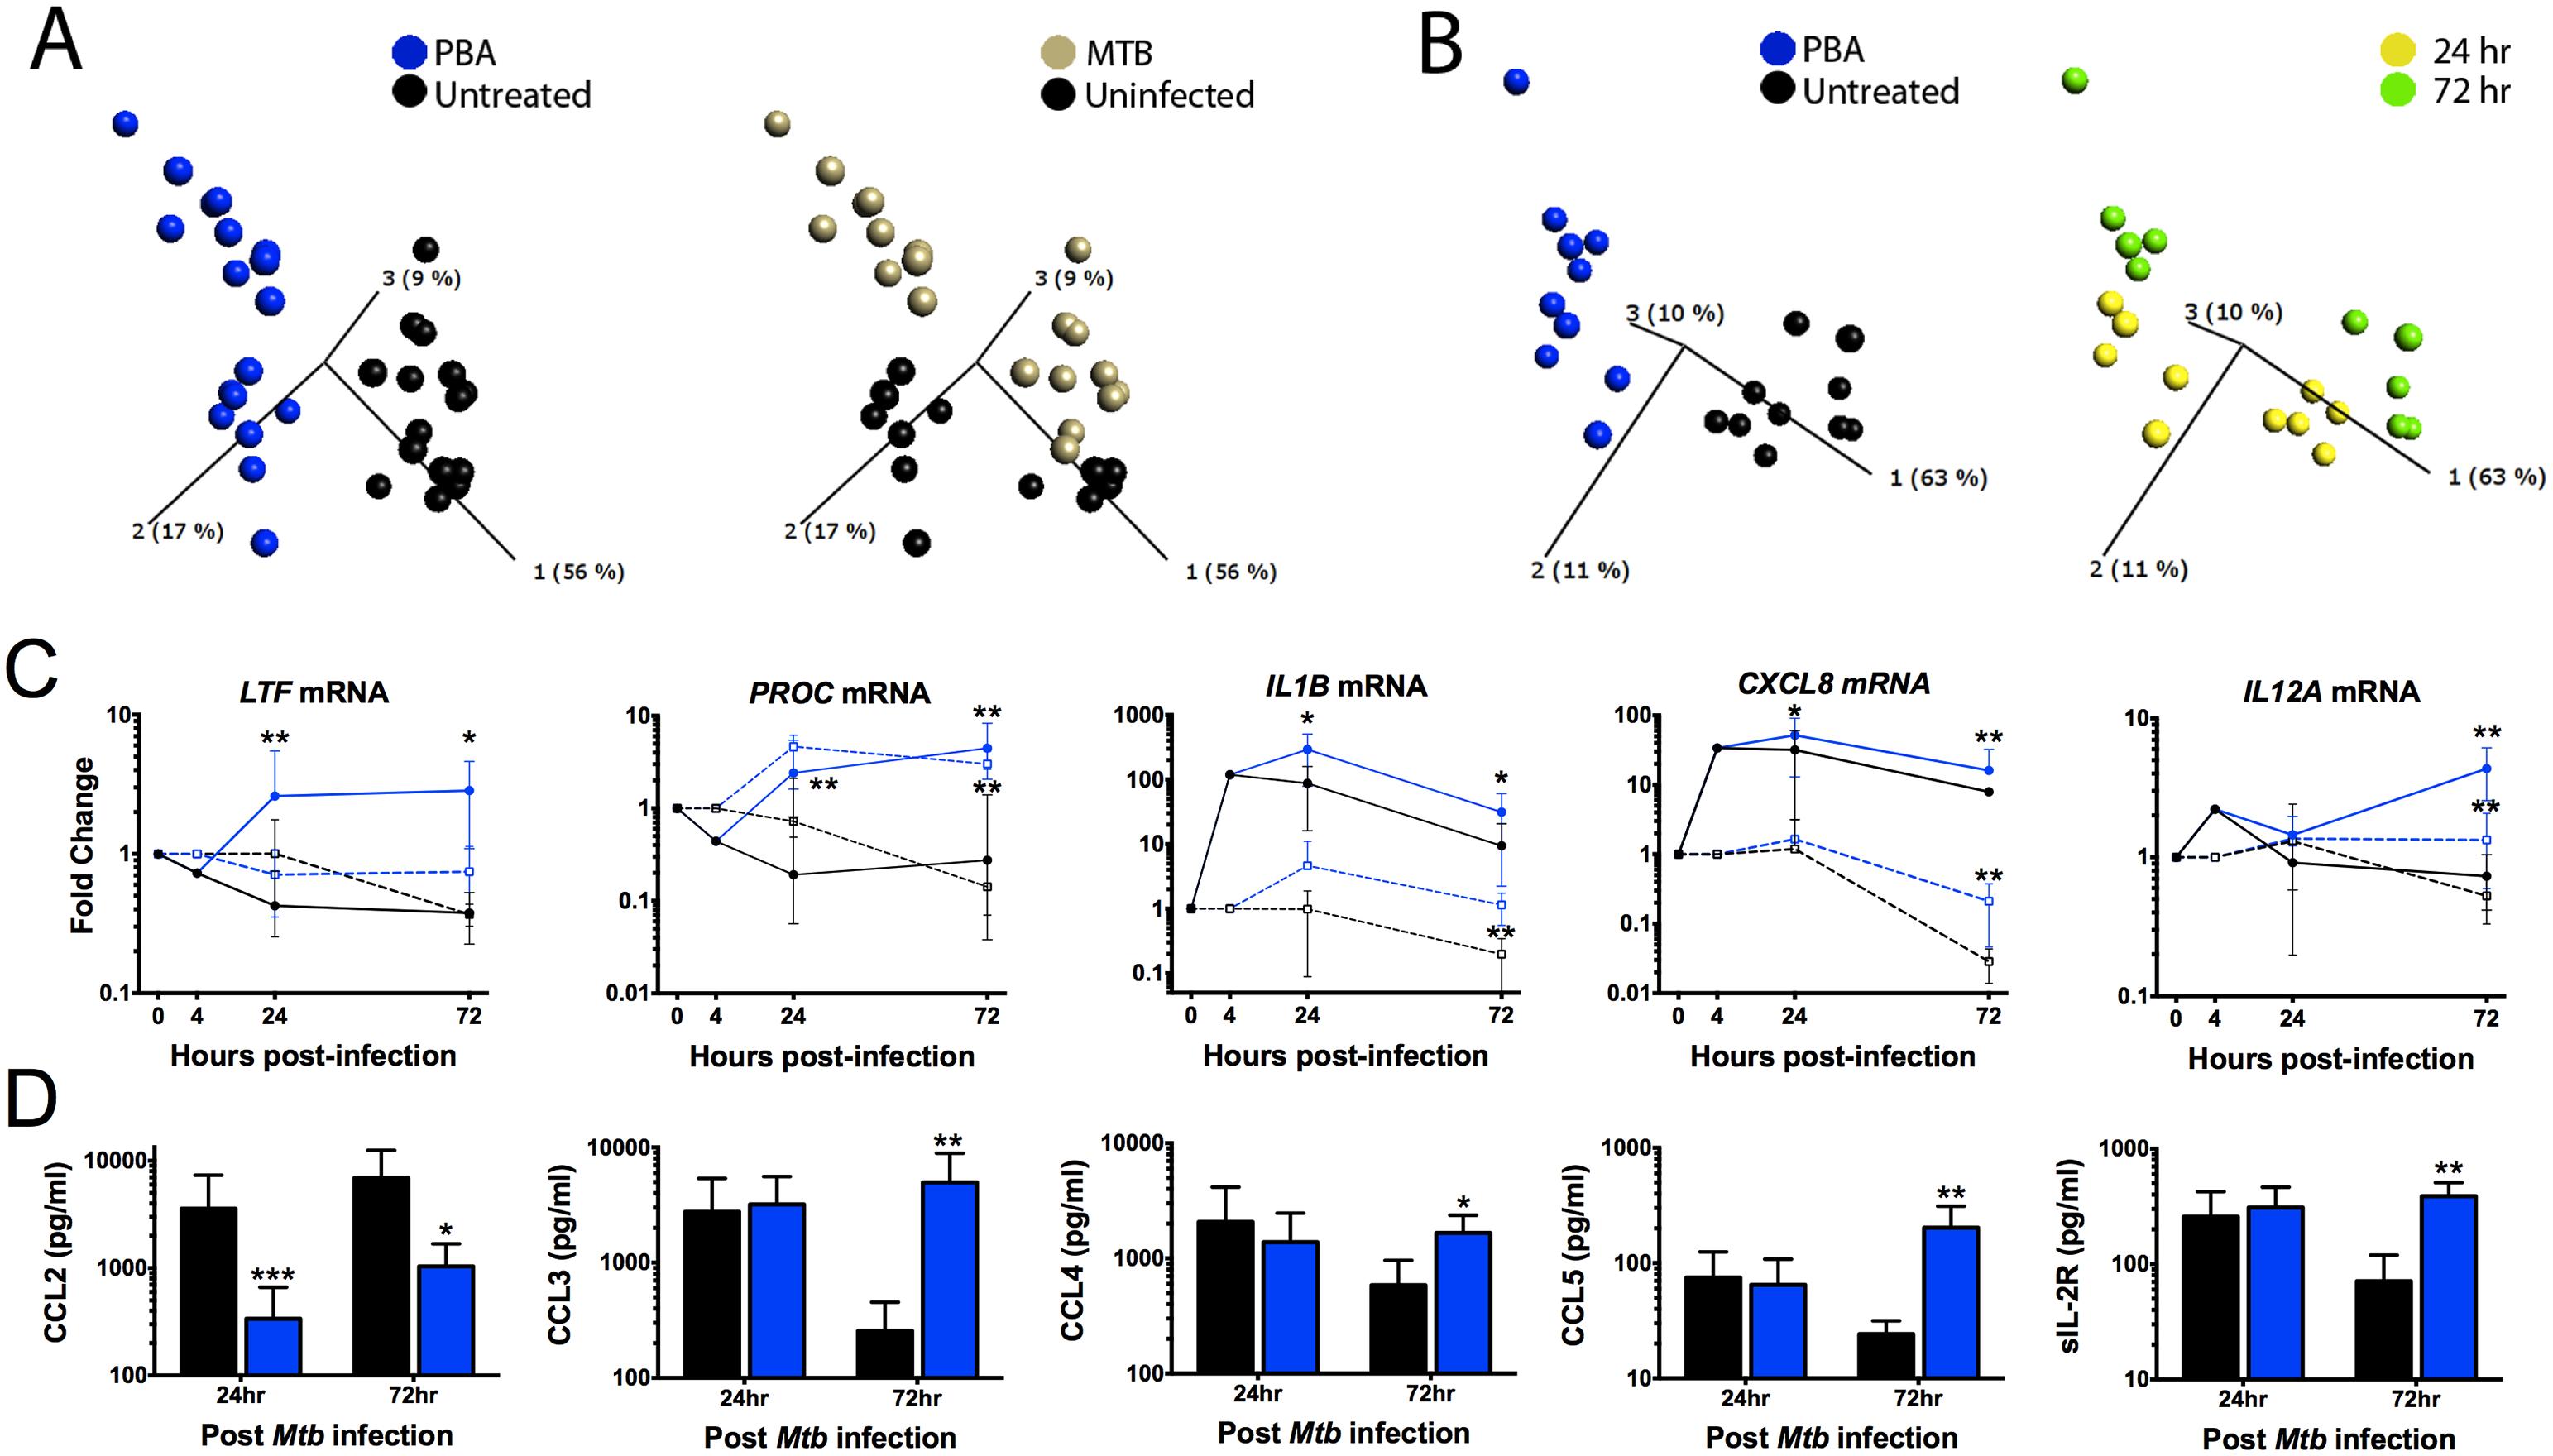 PBA modulates gene transcription by macrophages, irrespective of <i>Mtb</i> infection.